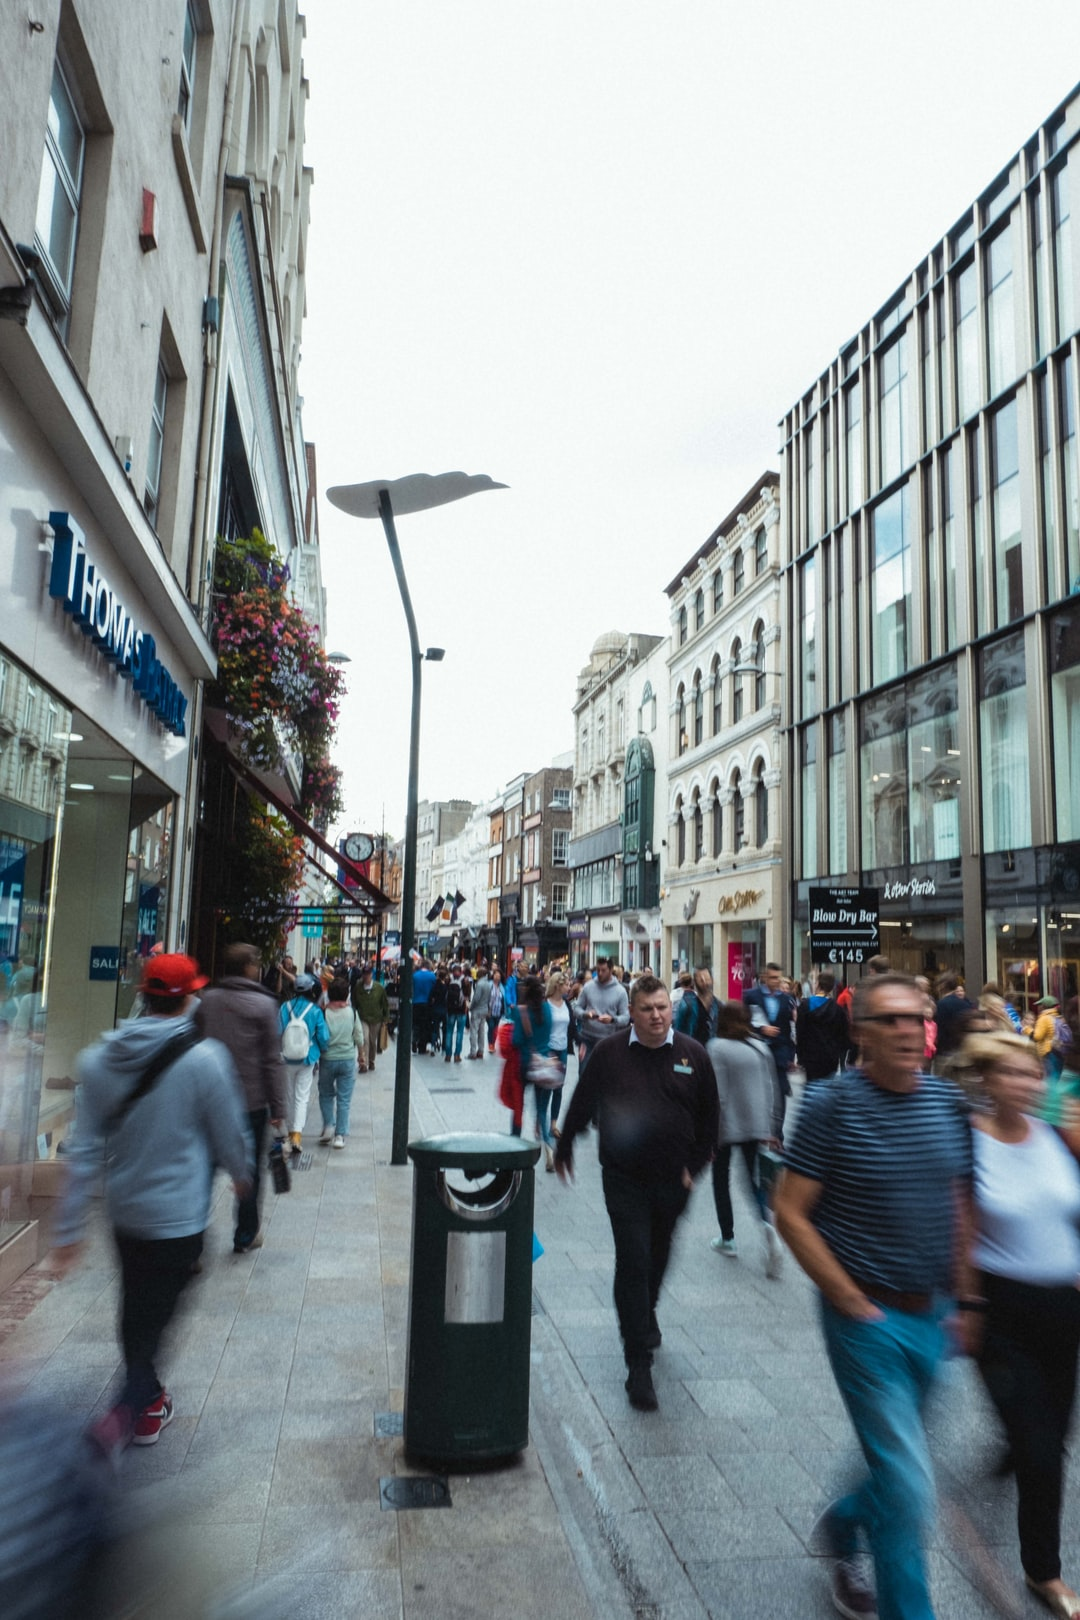 crowded street in Dublin, Ireland